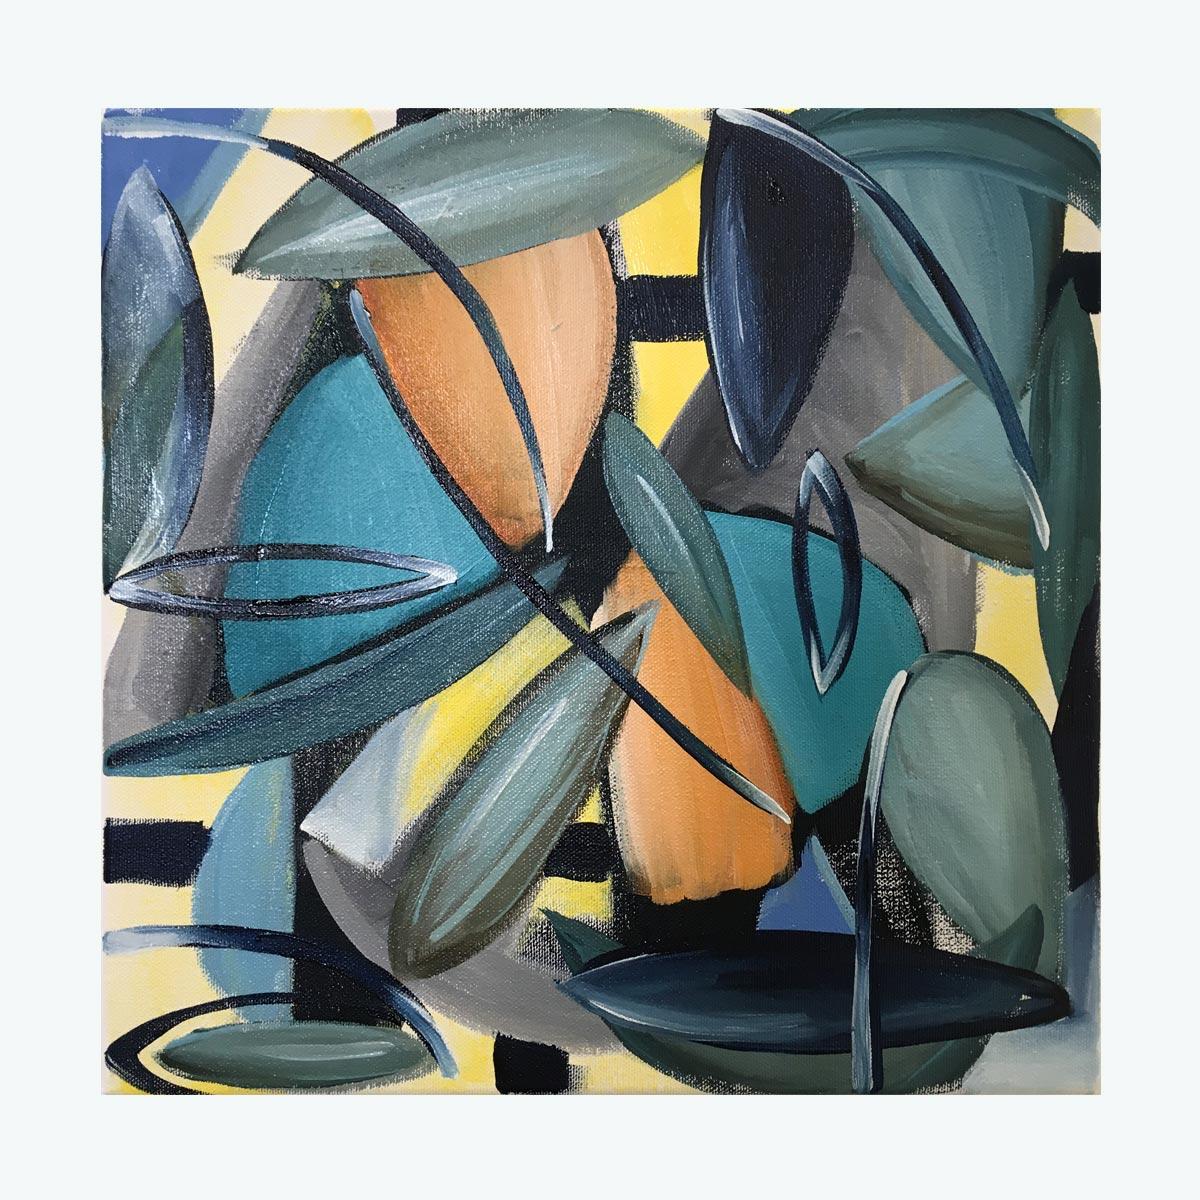 'Tent Metaphor' oil on canvas by Yatika Starr Fields